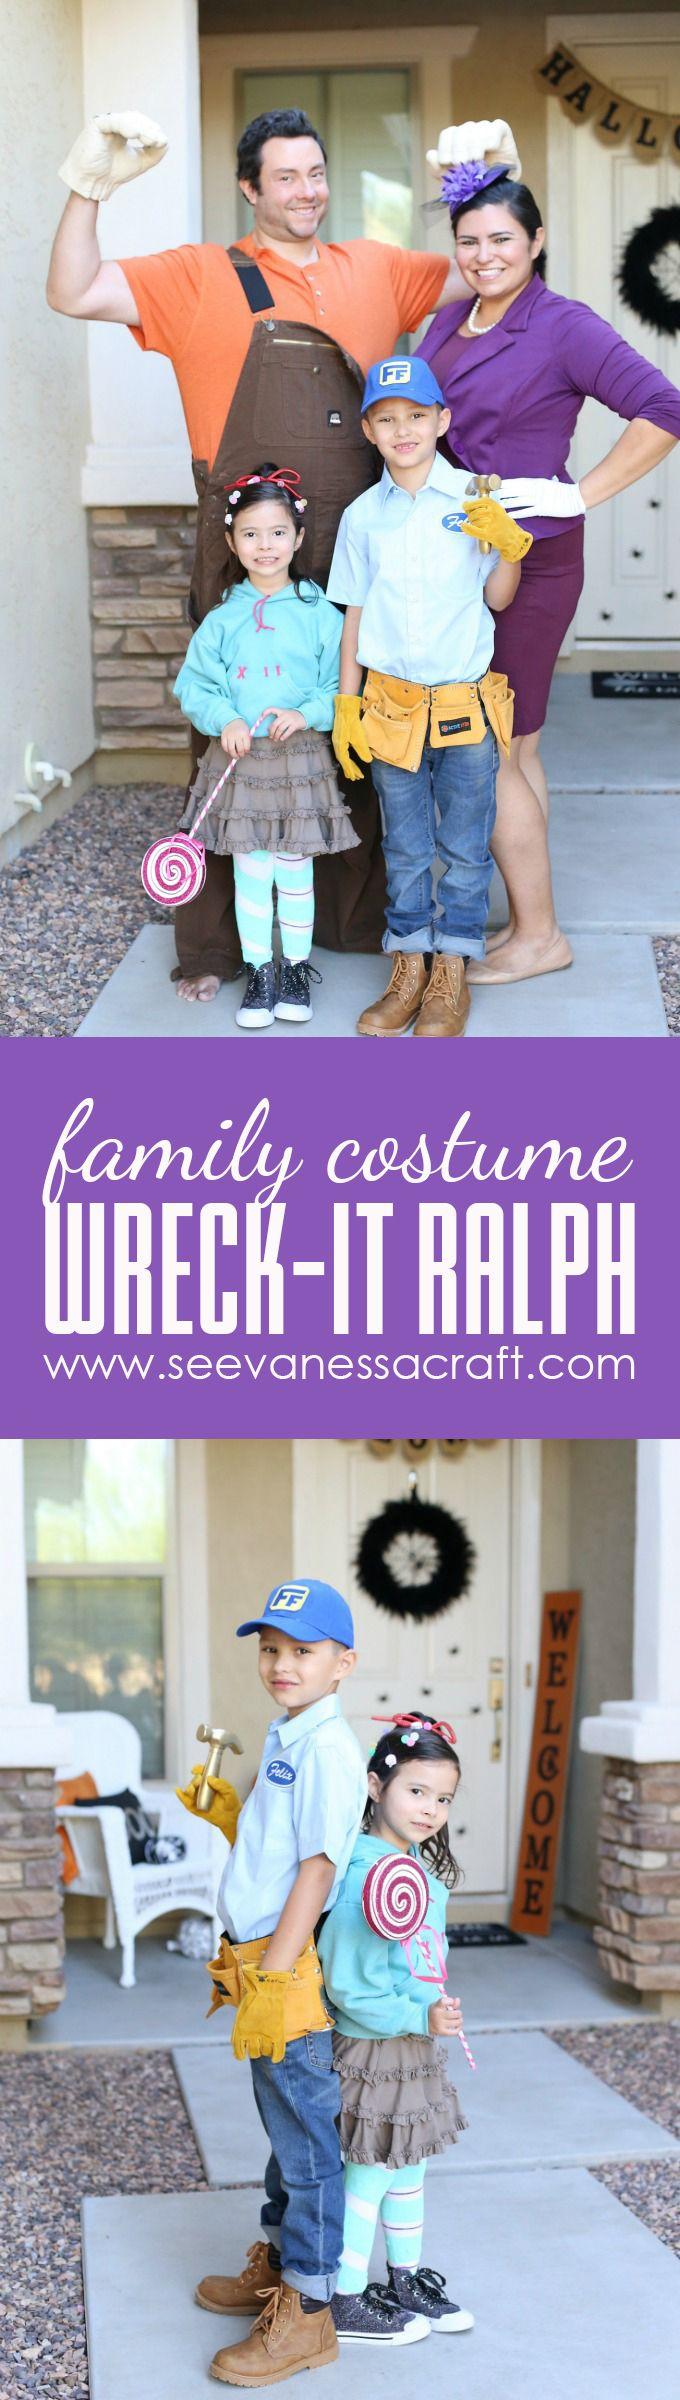 Halloween: DIY Wreck It Ralph Family Costume